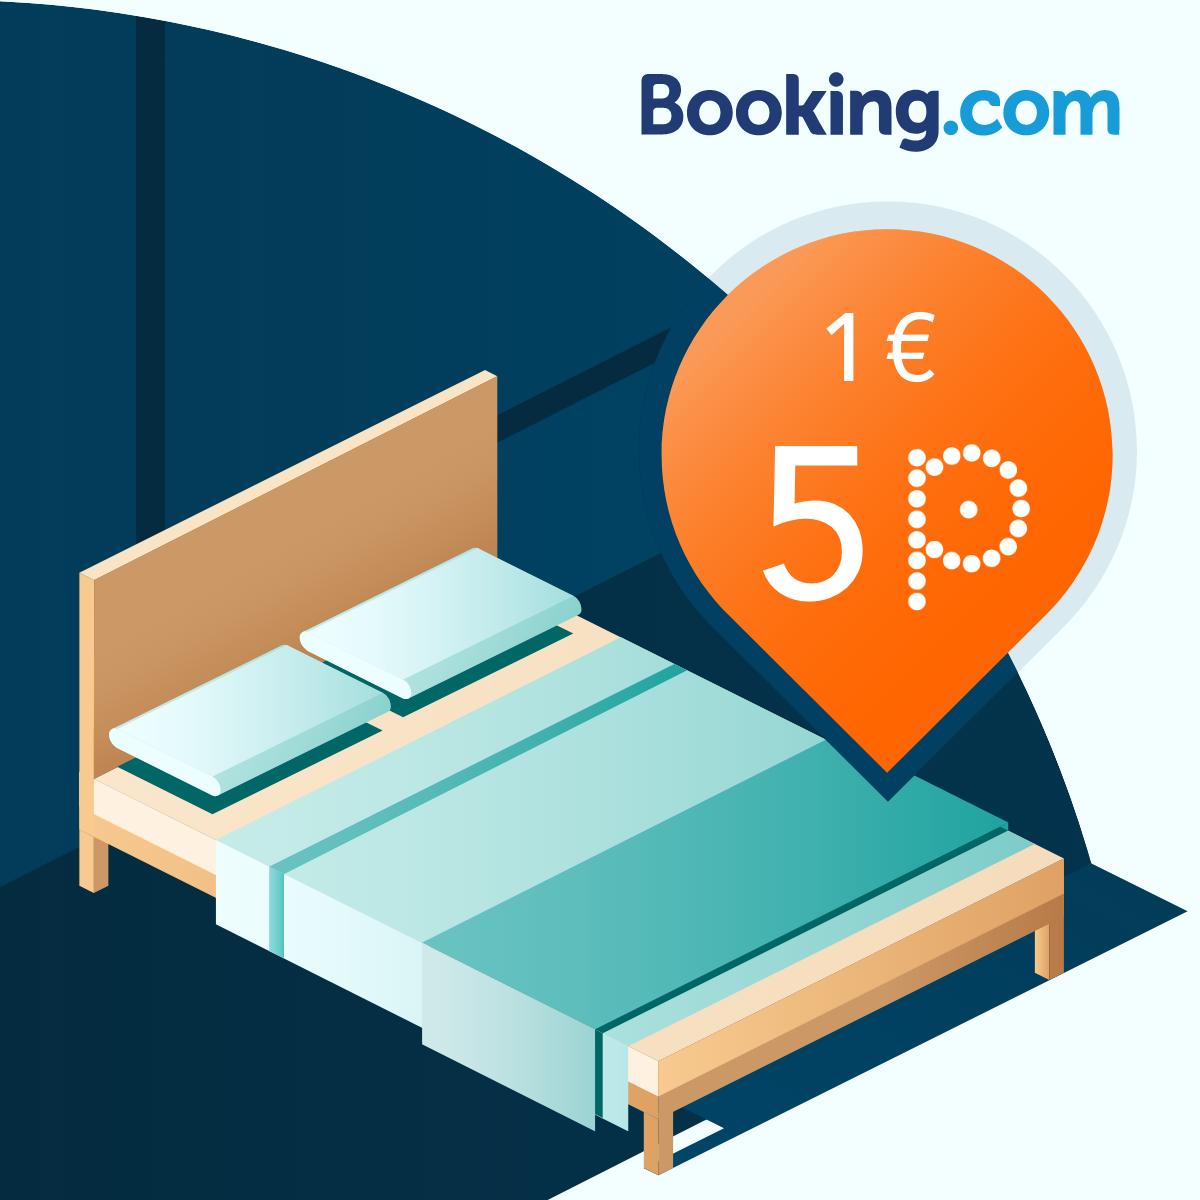 Tee varaus  Booking.com/pins-sivulla ja kerää 5P/EUR! image